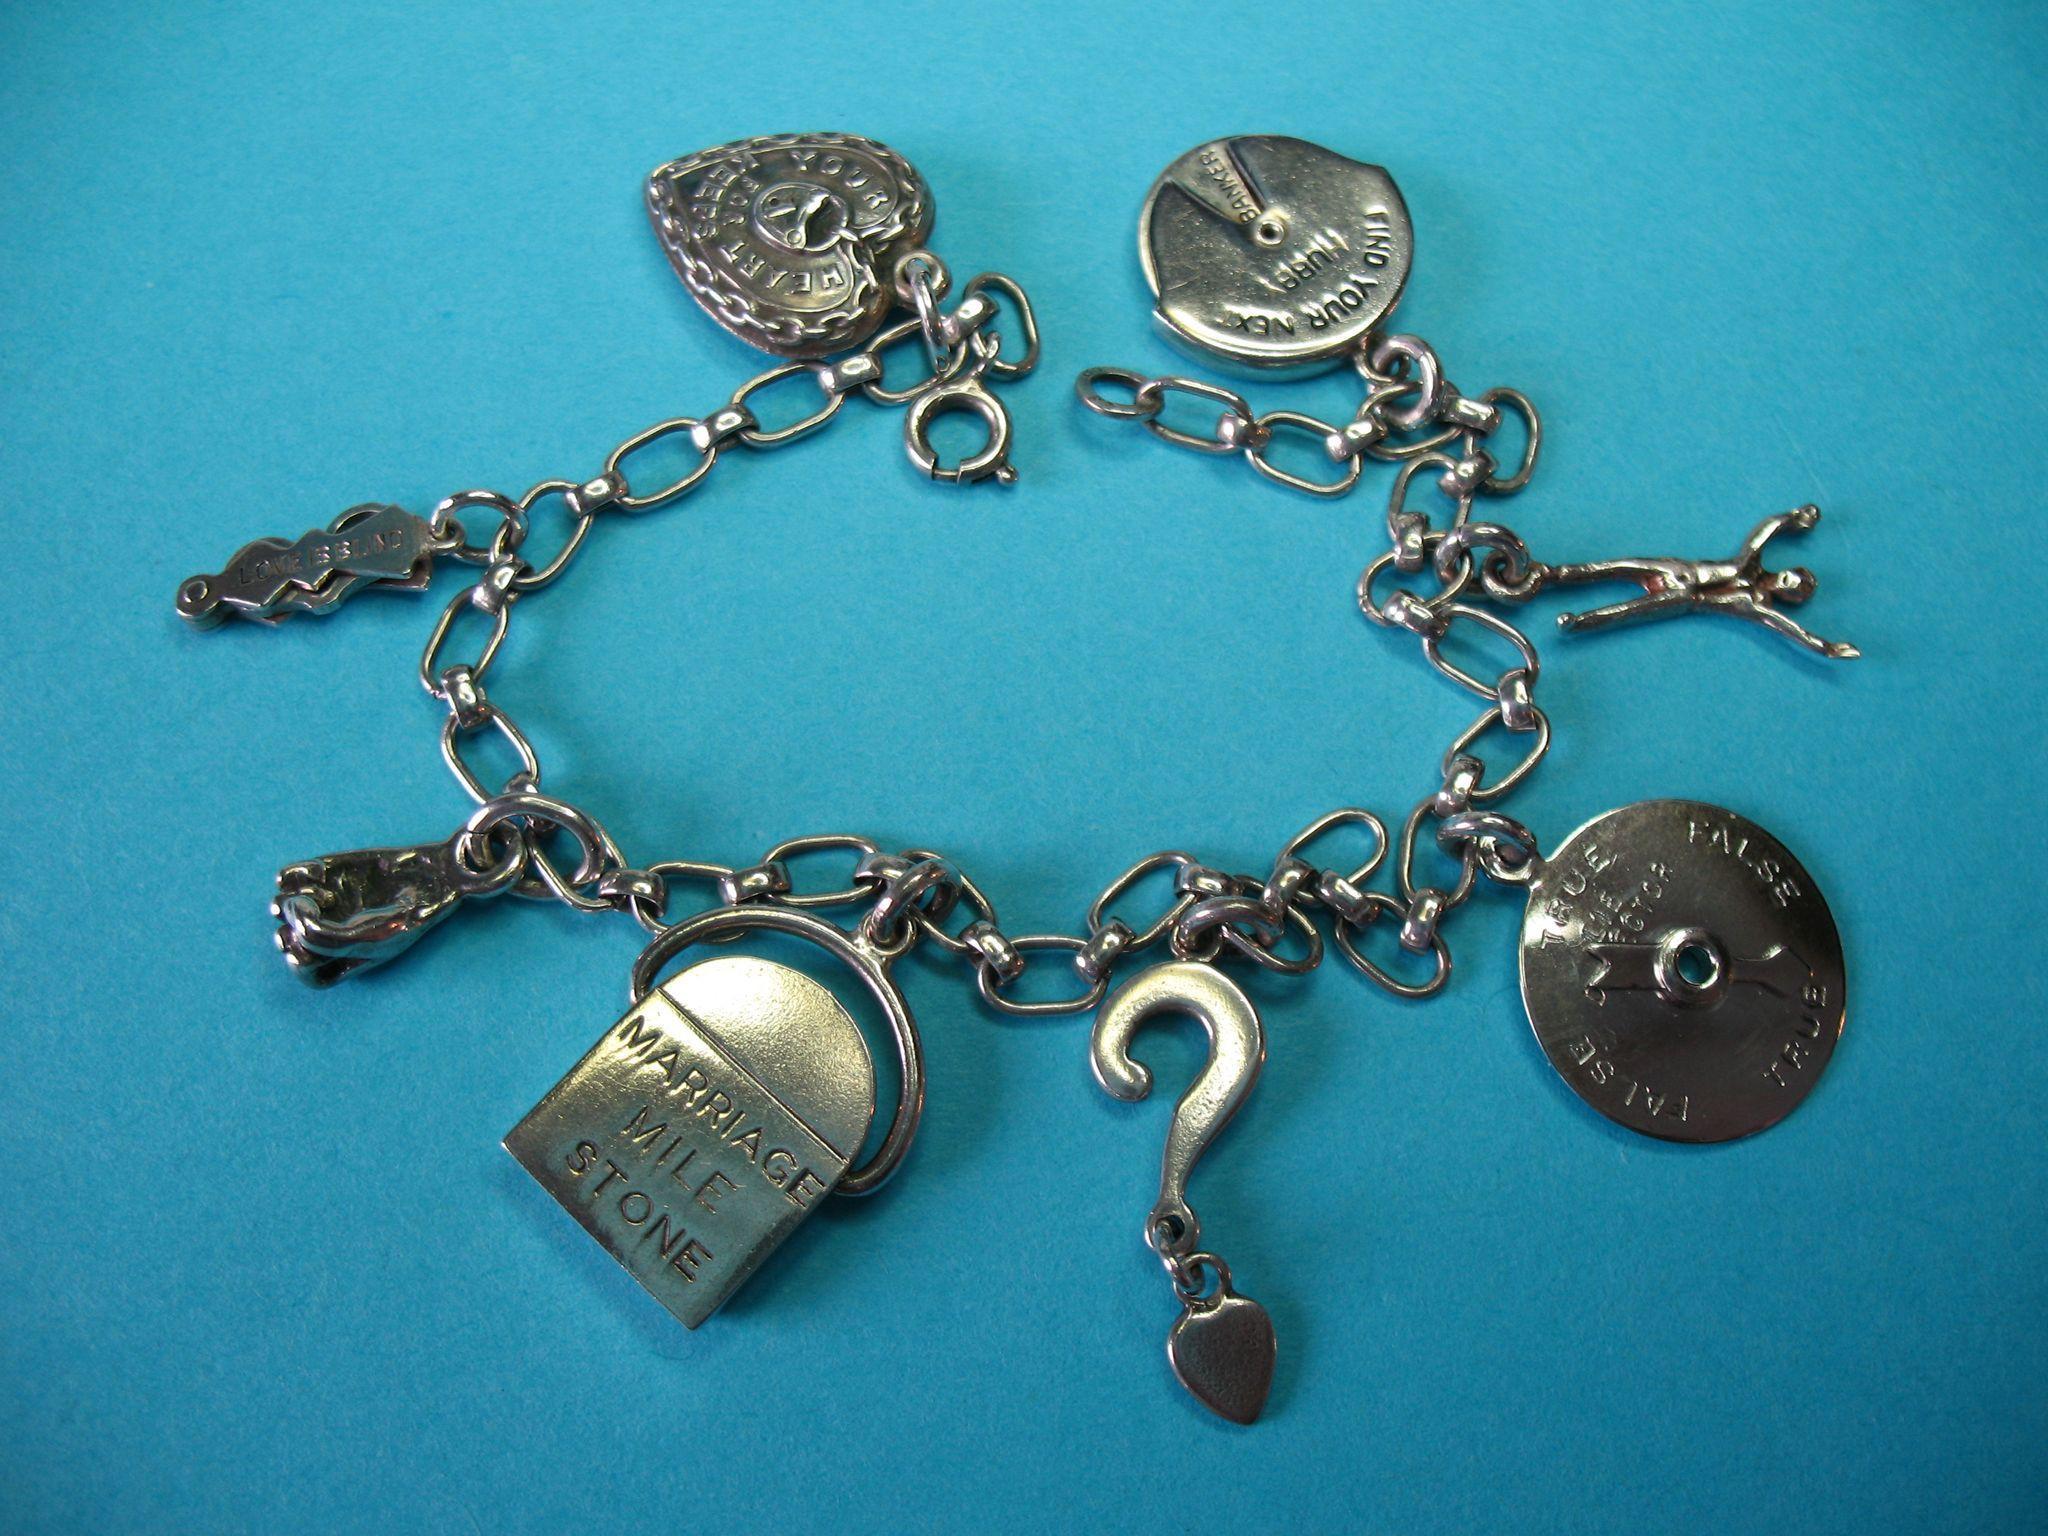 Vintage Sterling Silver Charm Bracelet - RARE Georg Jensen